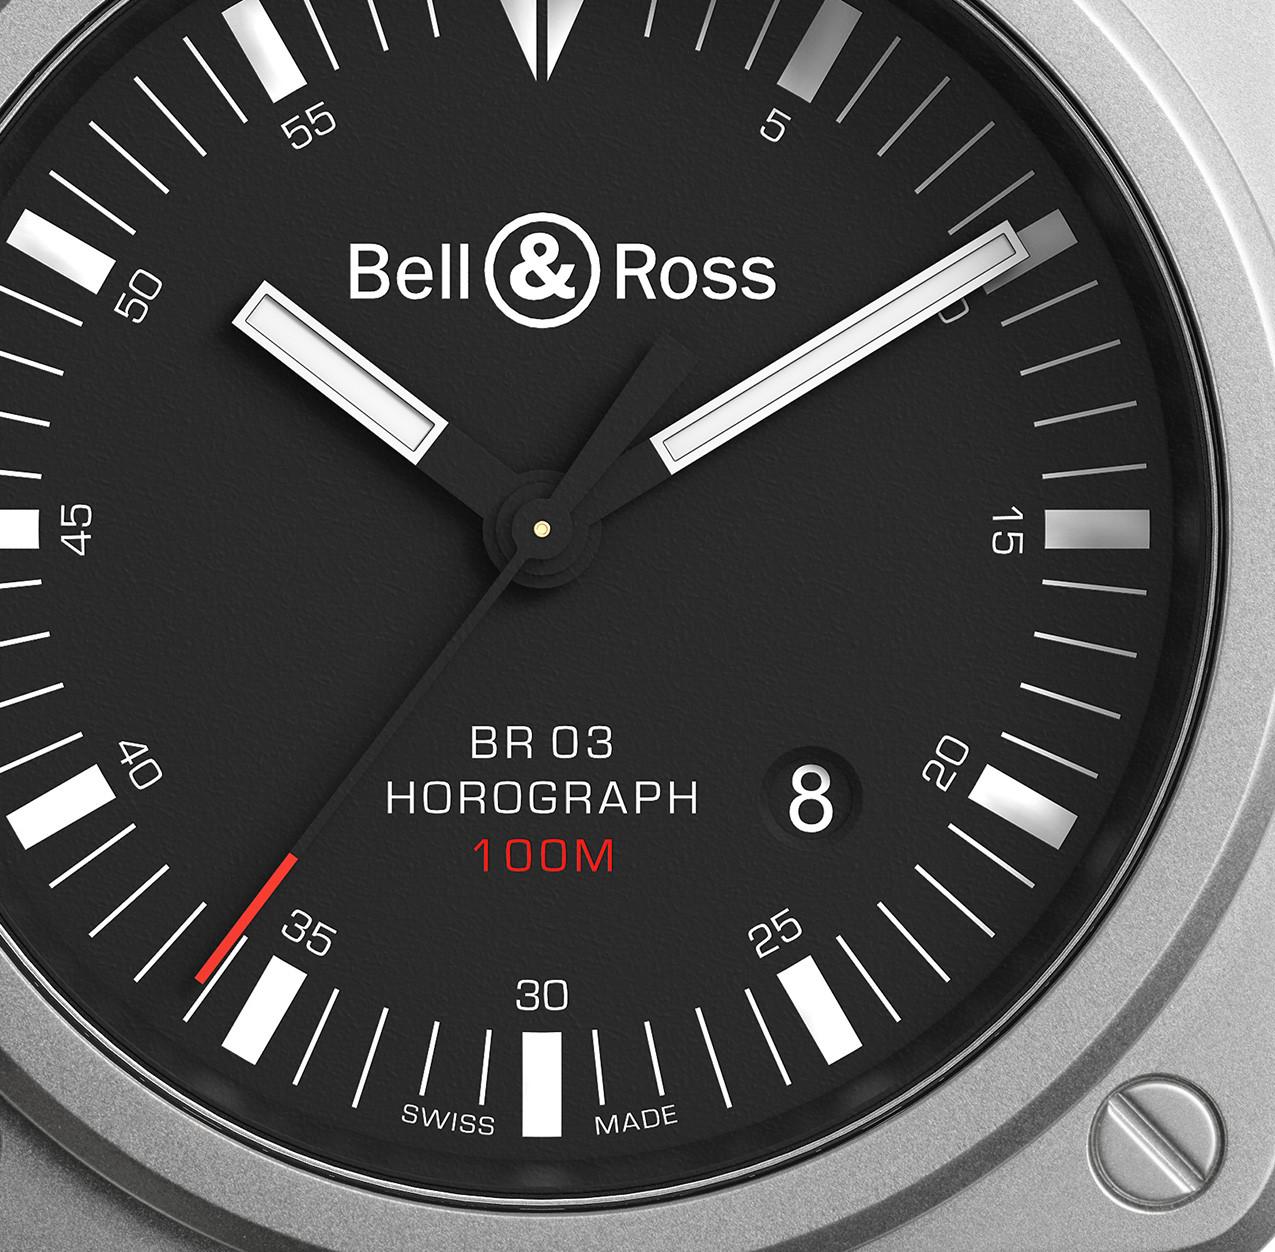 BR03 Horograph Focus